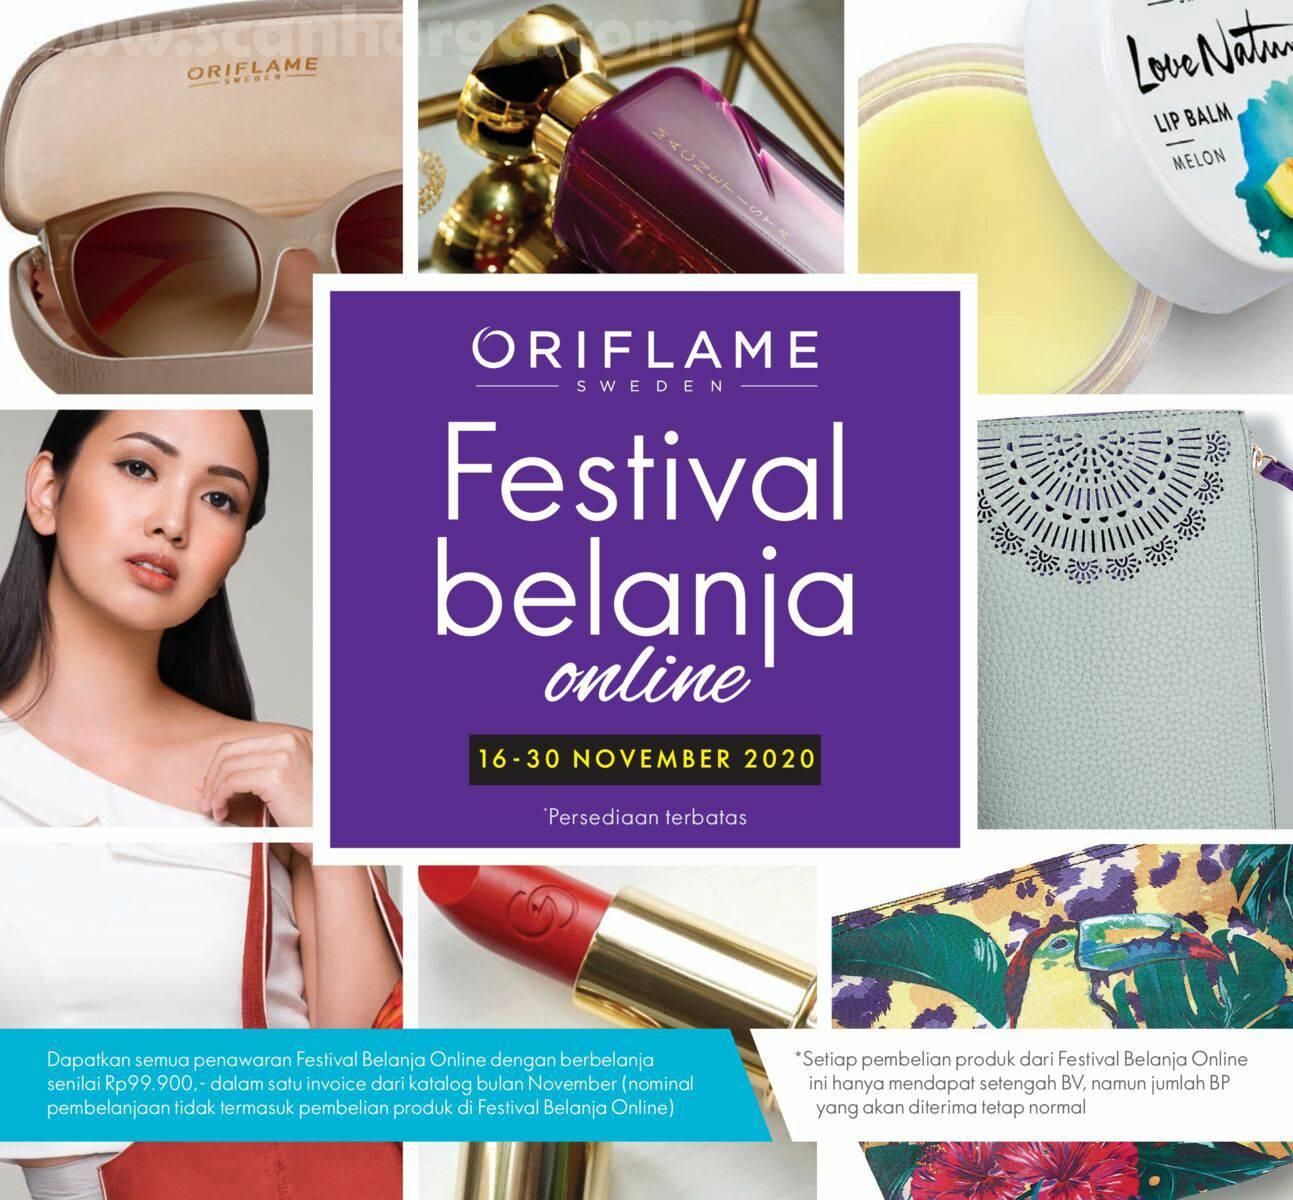 Promo Oriflame Festival Belanja Online 16 - 30 November 2020